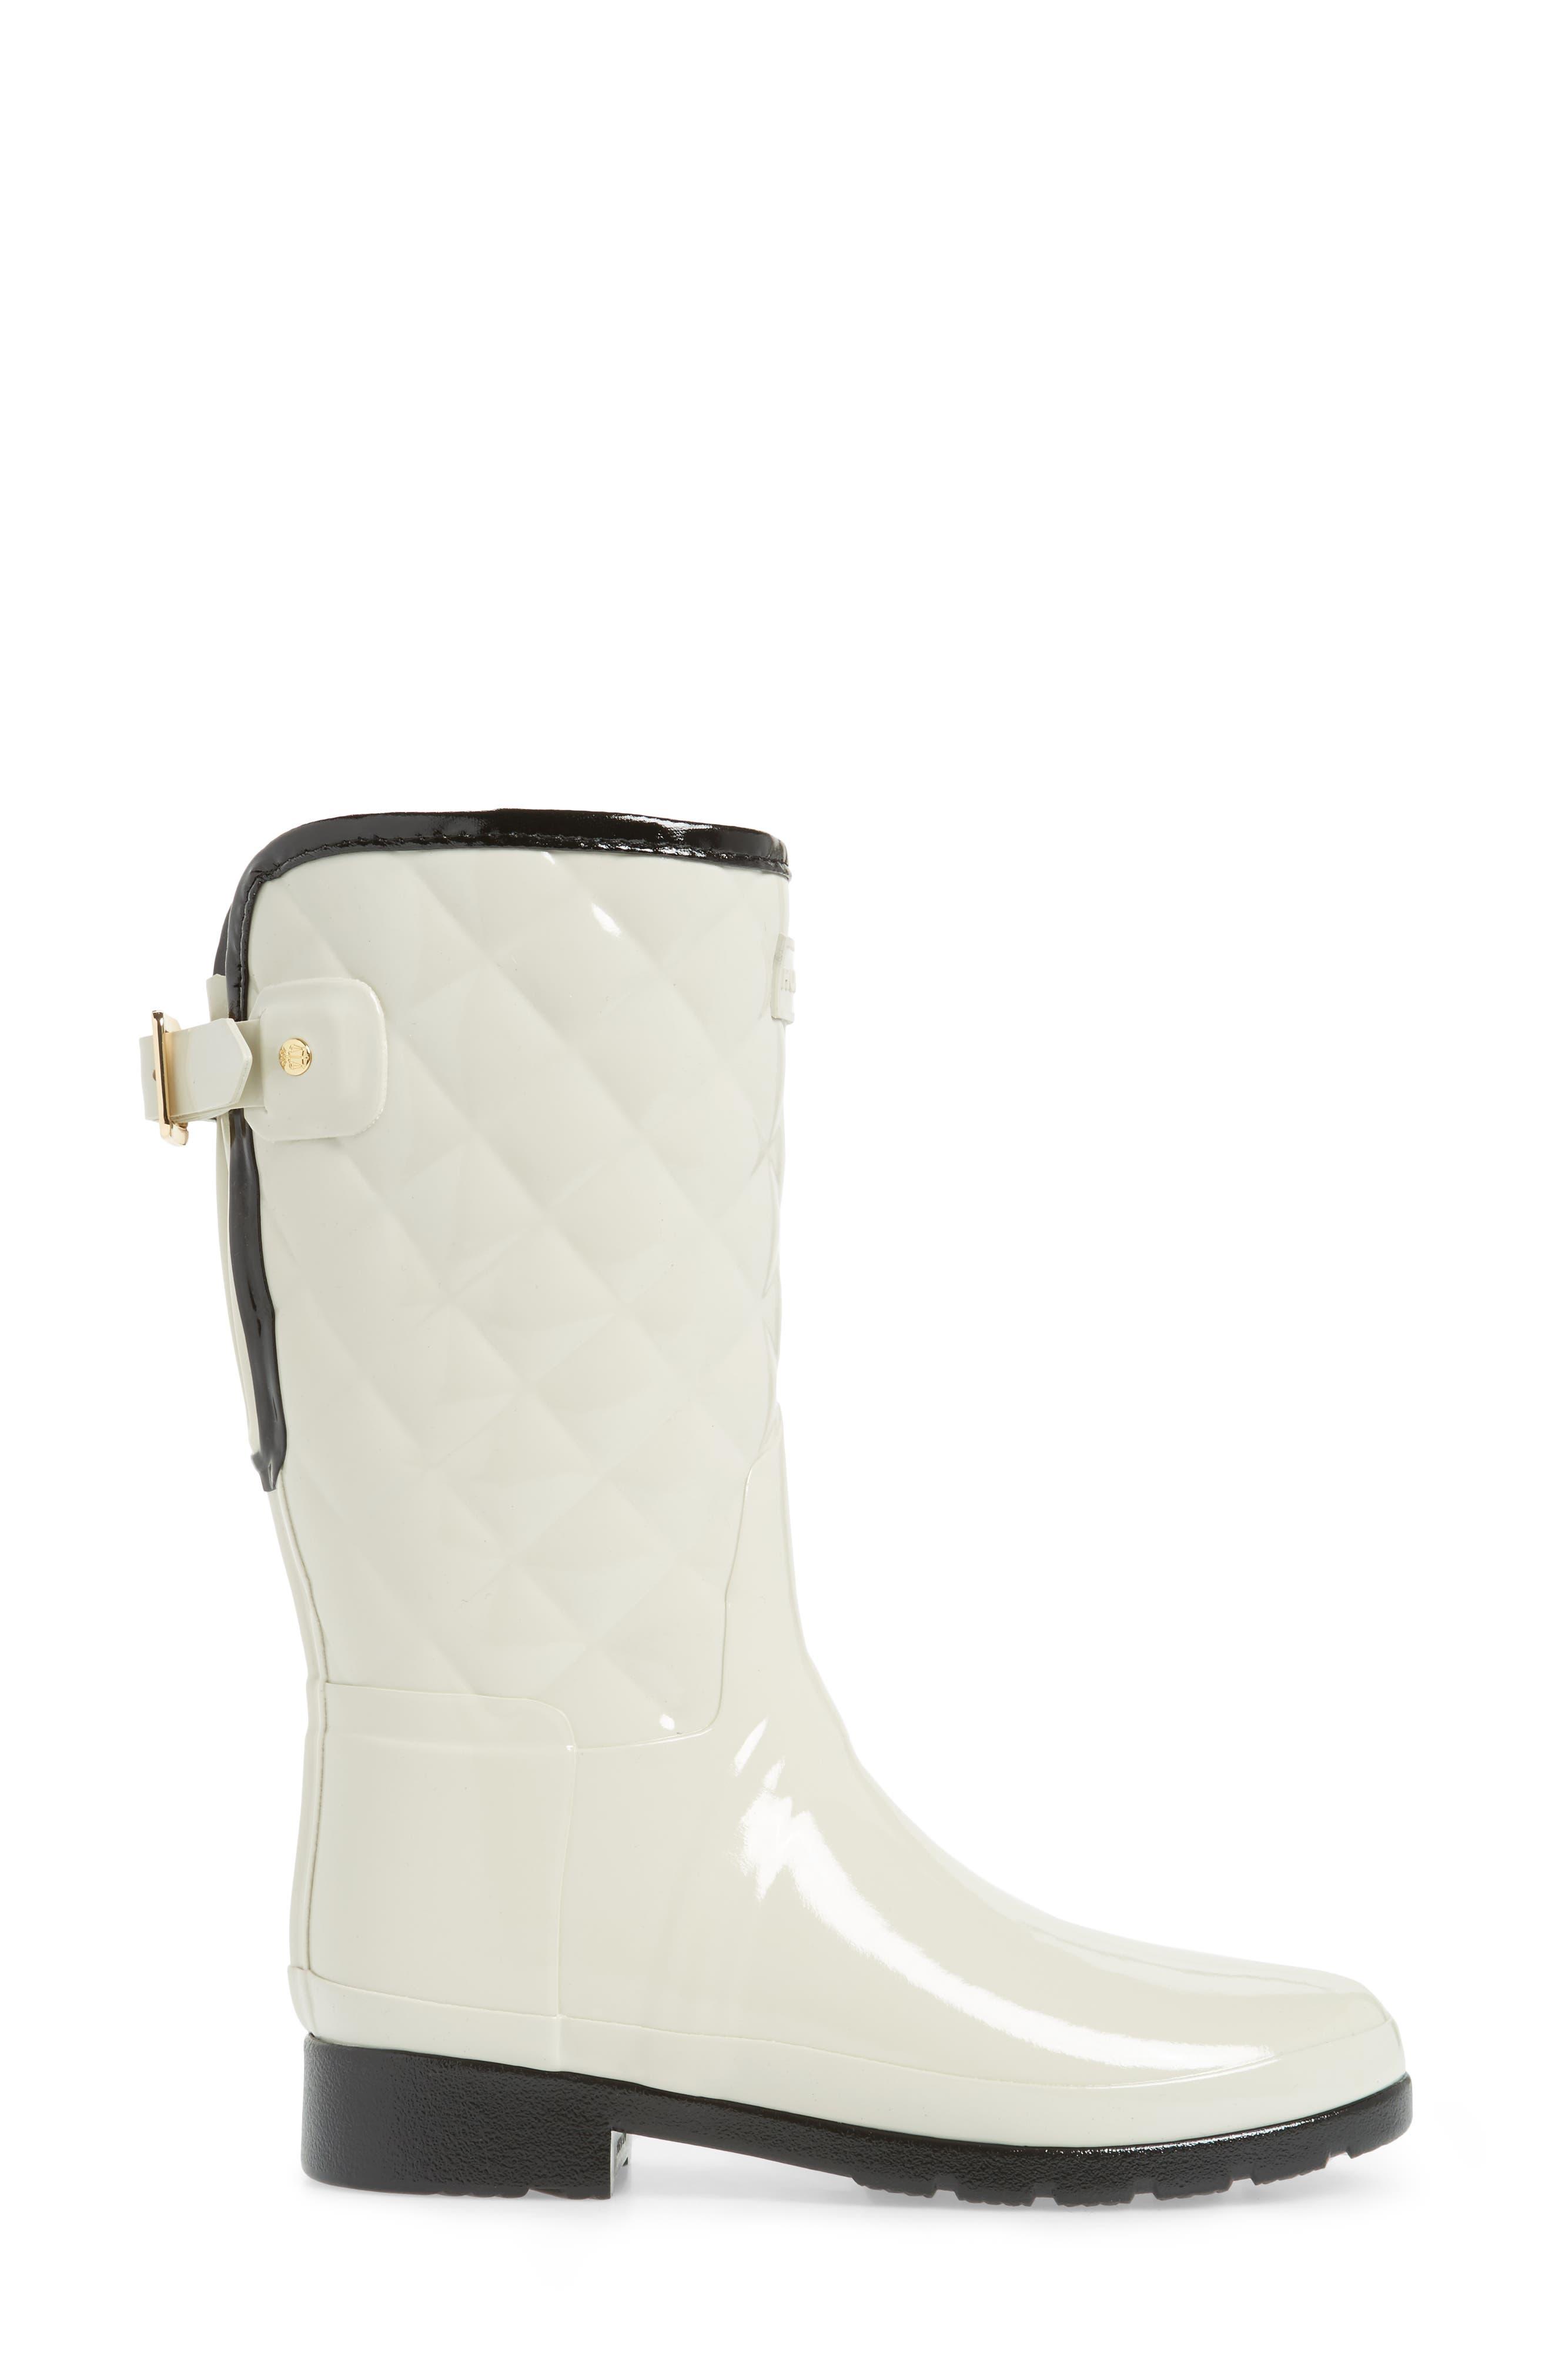 Alternate Image 3  - Hunter Refined High Gloss Quilted Short Rain Boot (Women)